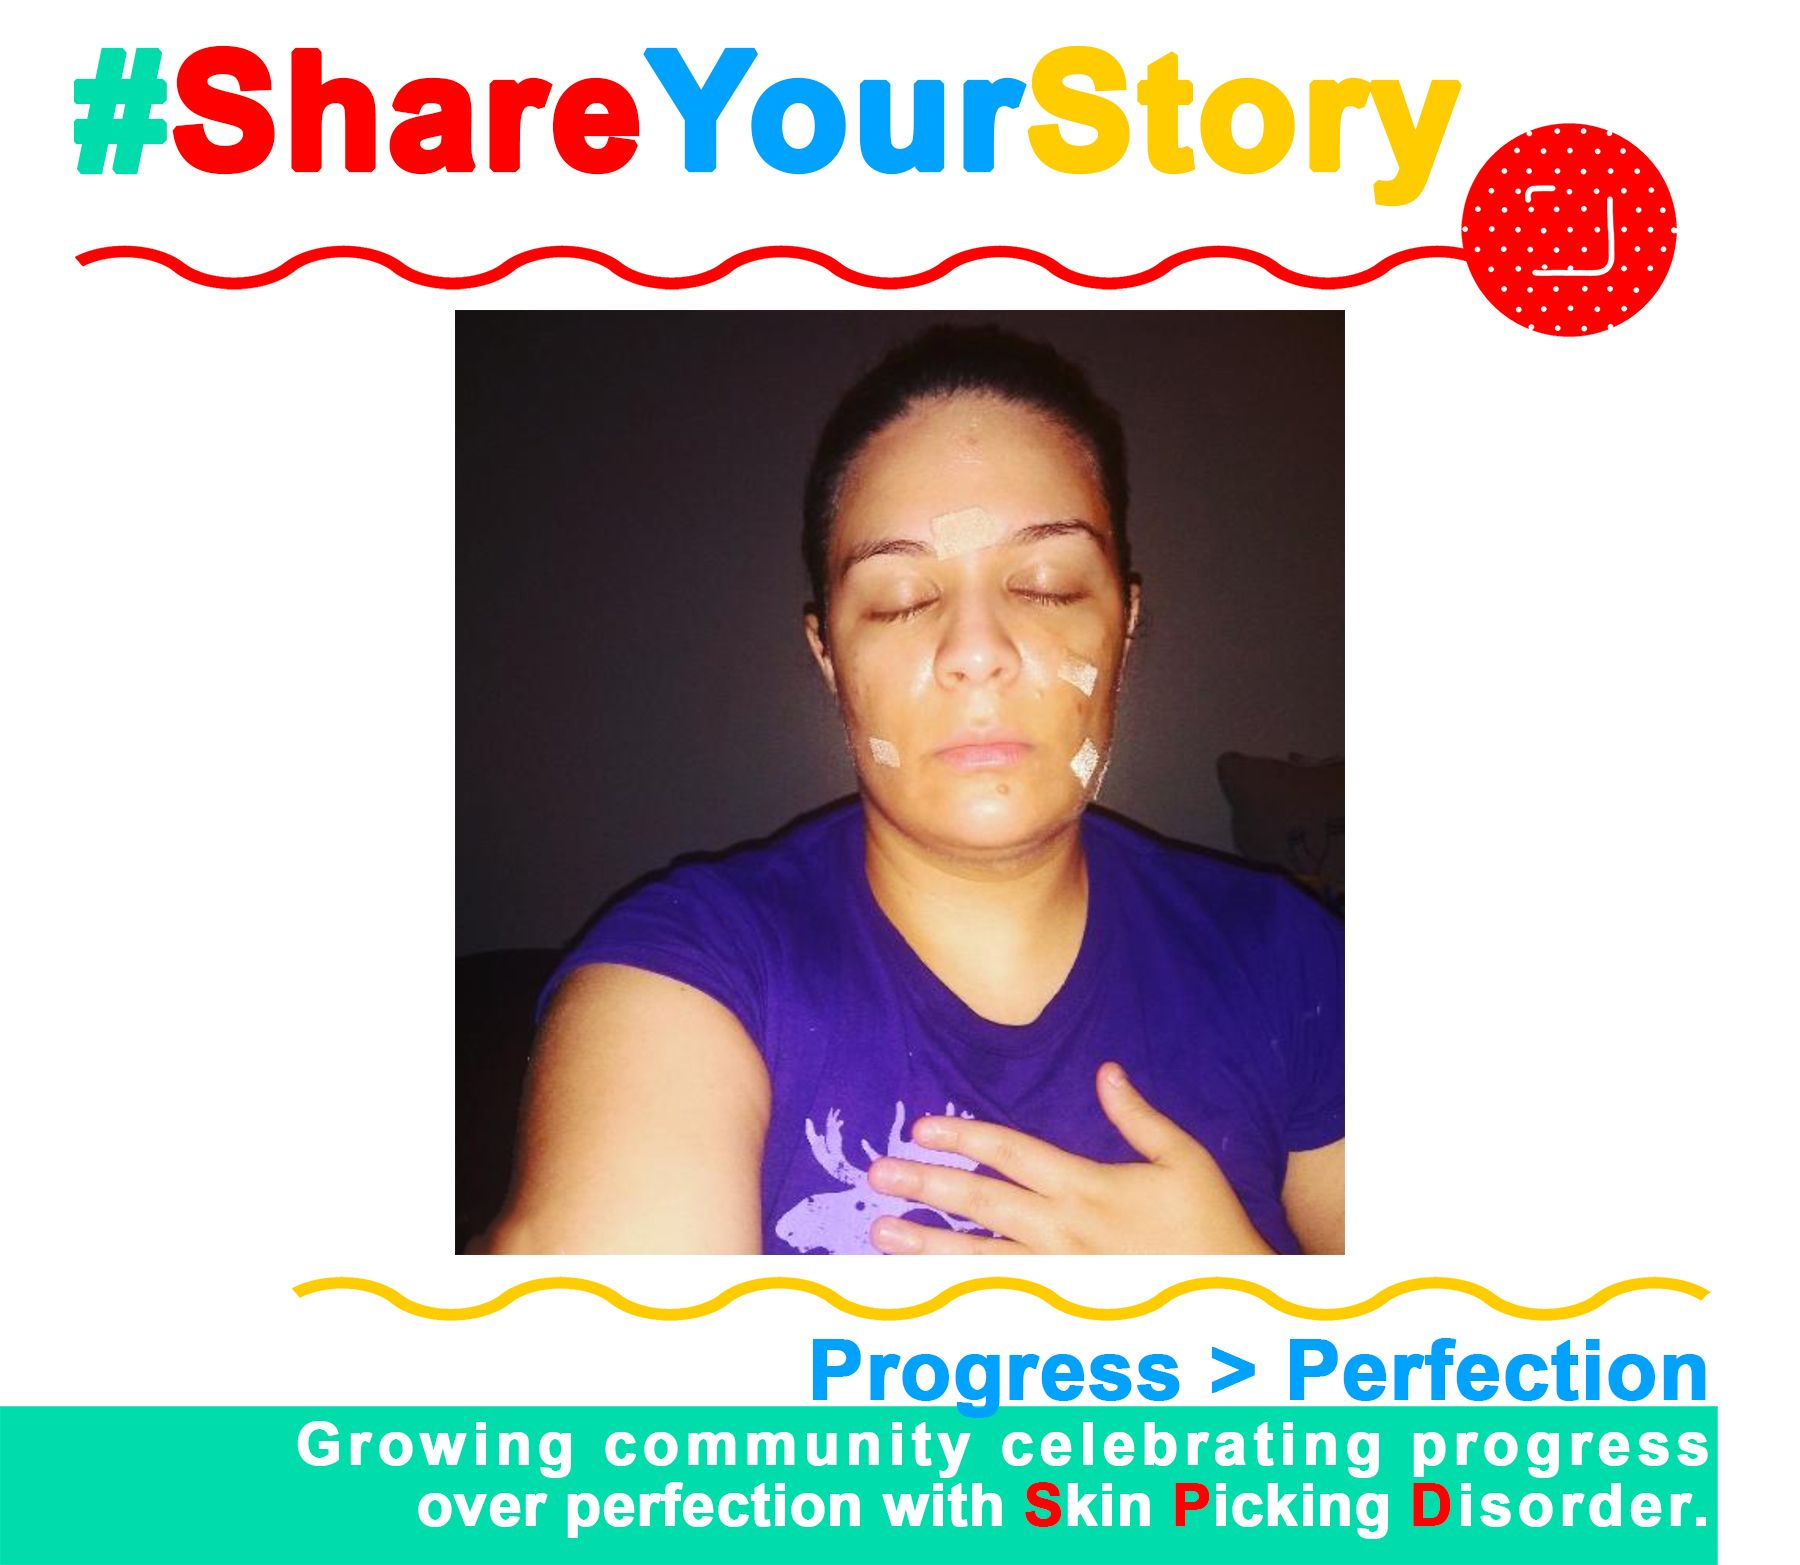 #ShareYourStory: @Amourdivina